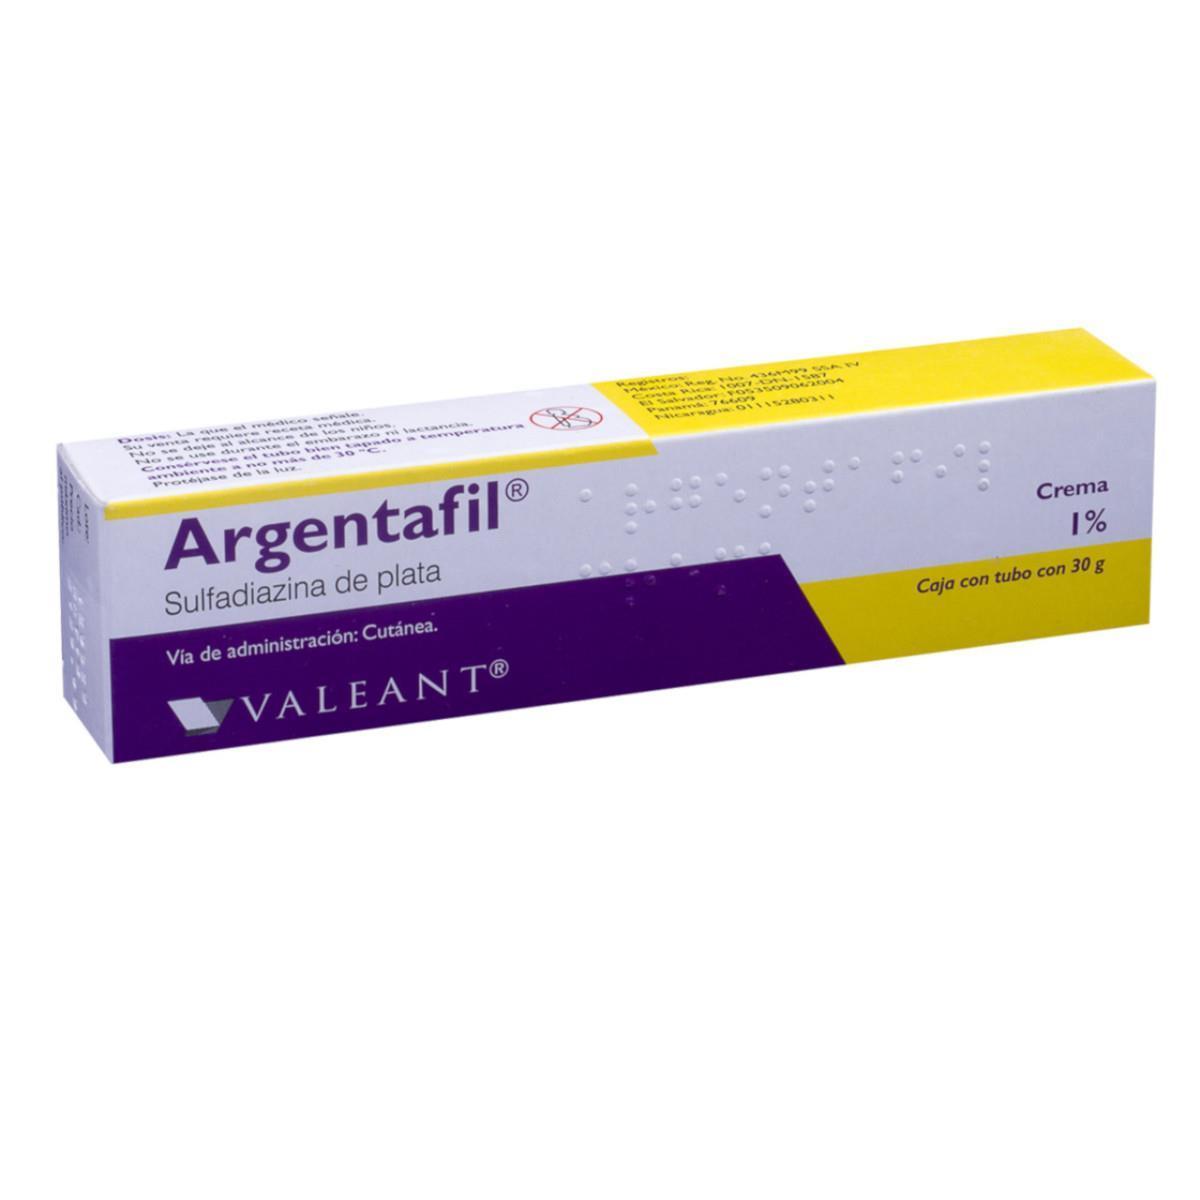 Argentafil Crema Al 1% Tubo De 30 G